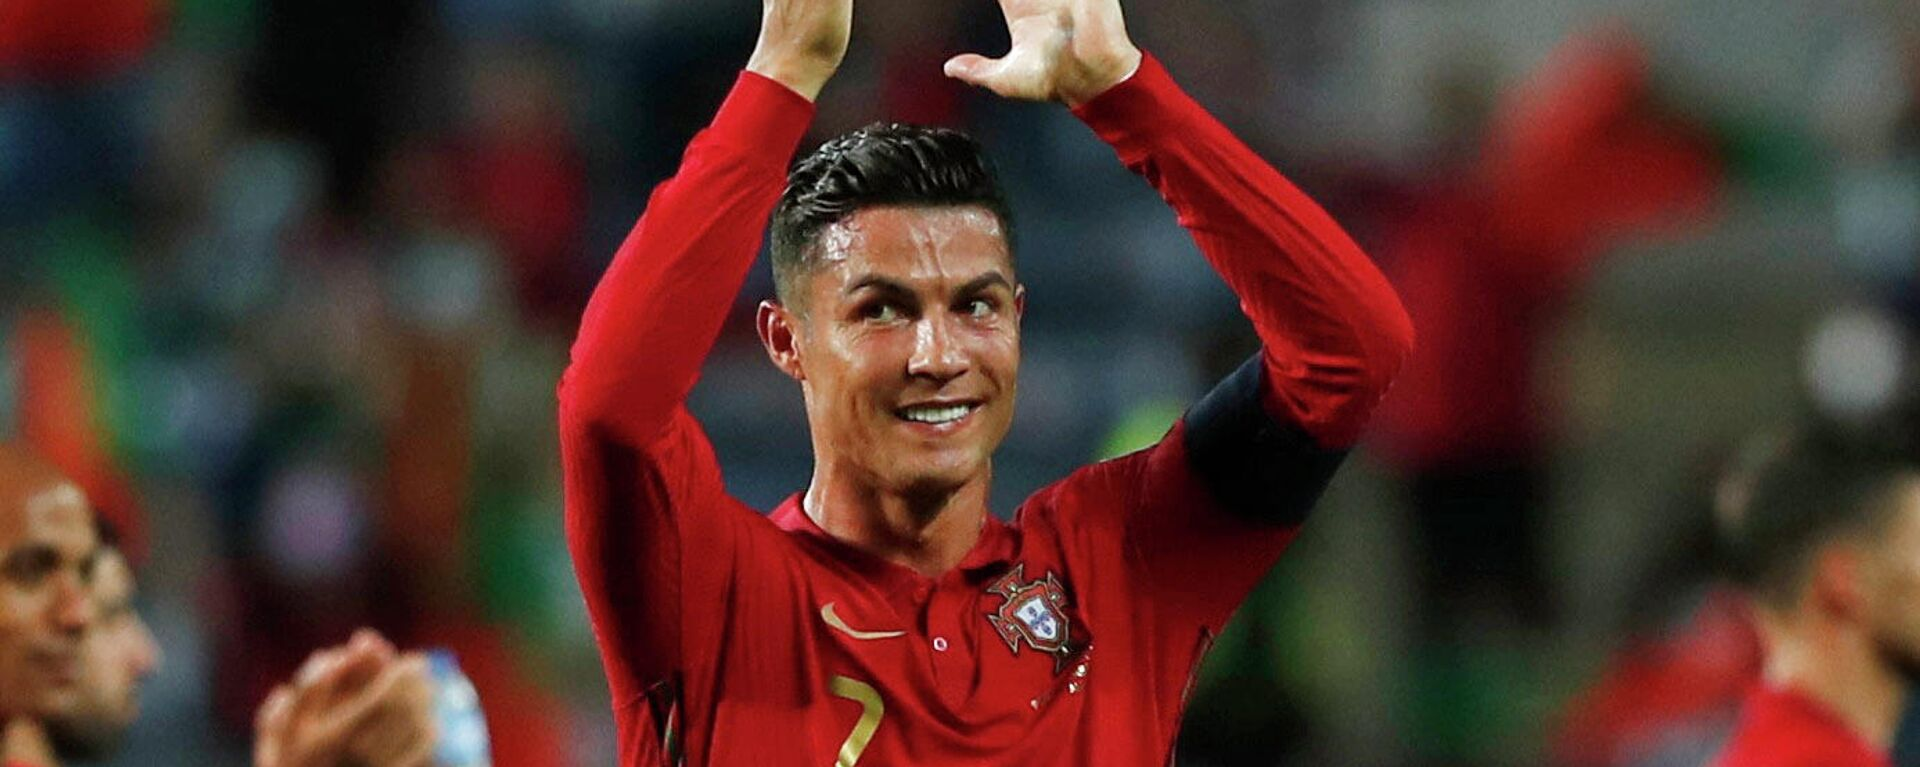 Cristiano Ronaldo - Sputnik Mundo, 1920, 02.09.2021